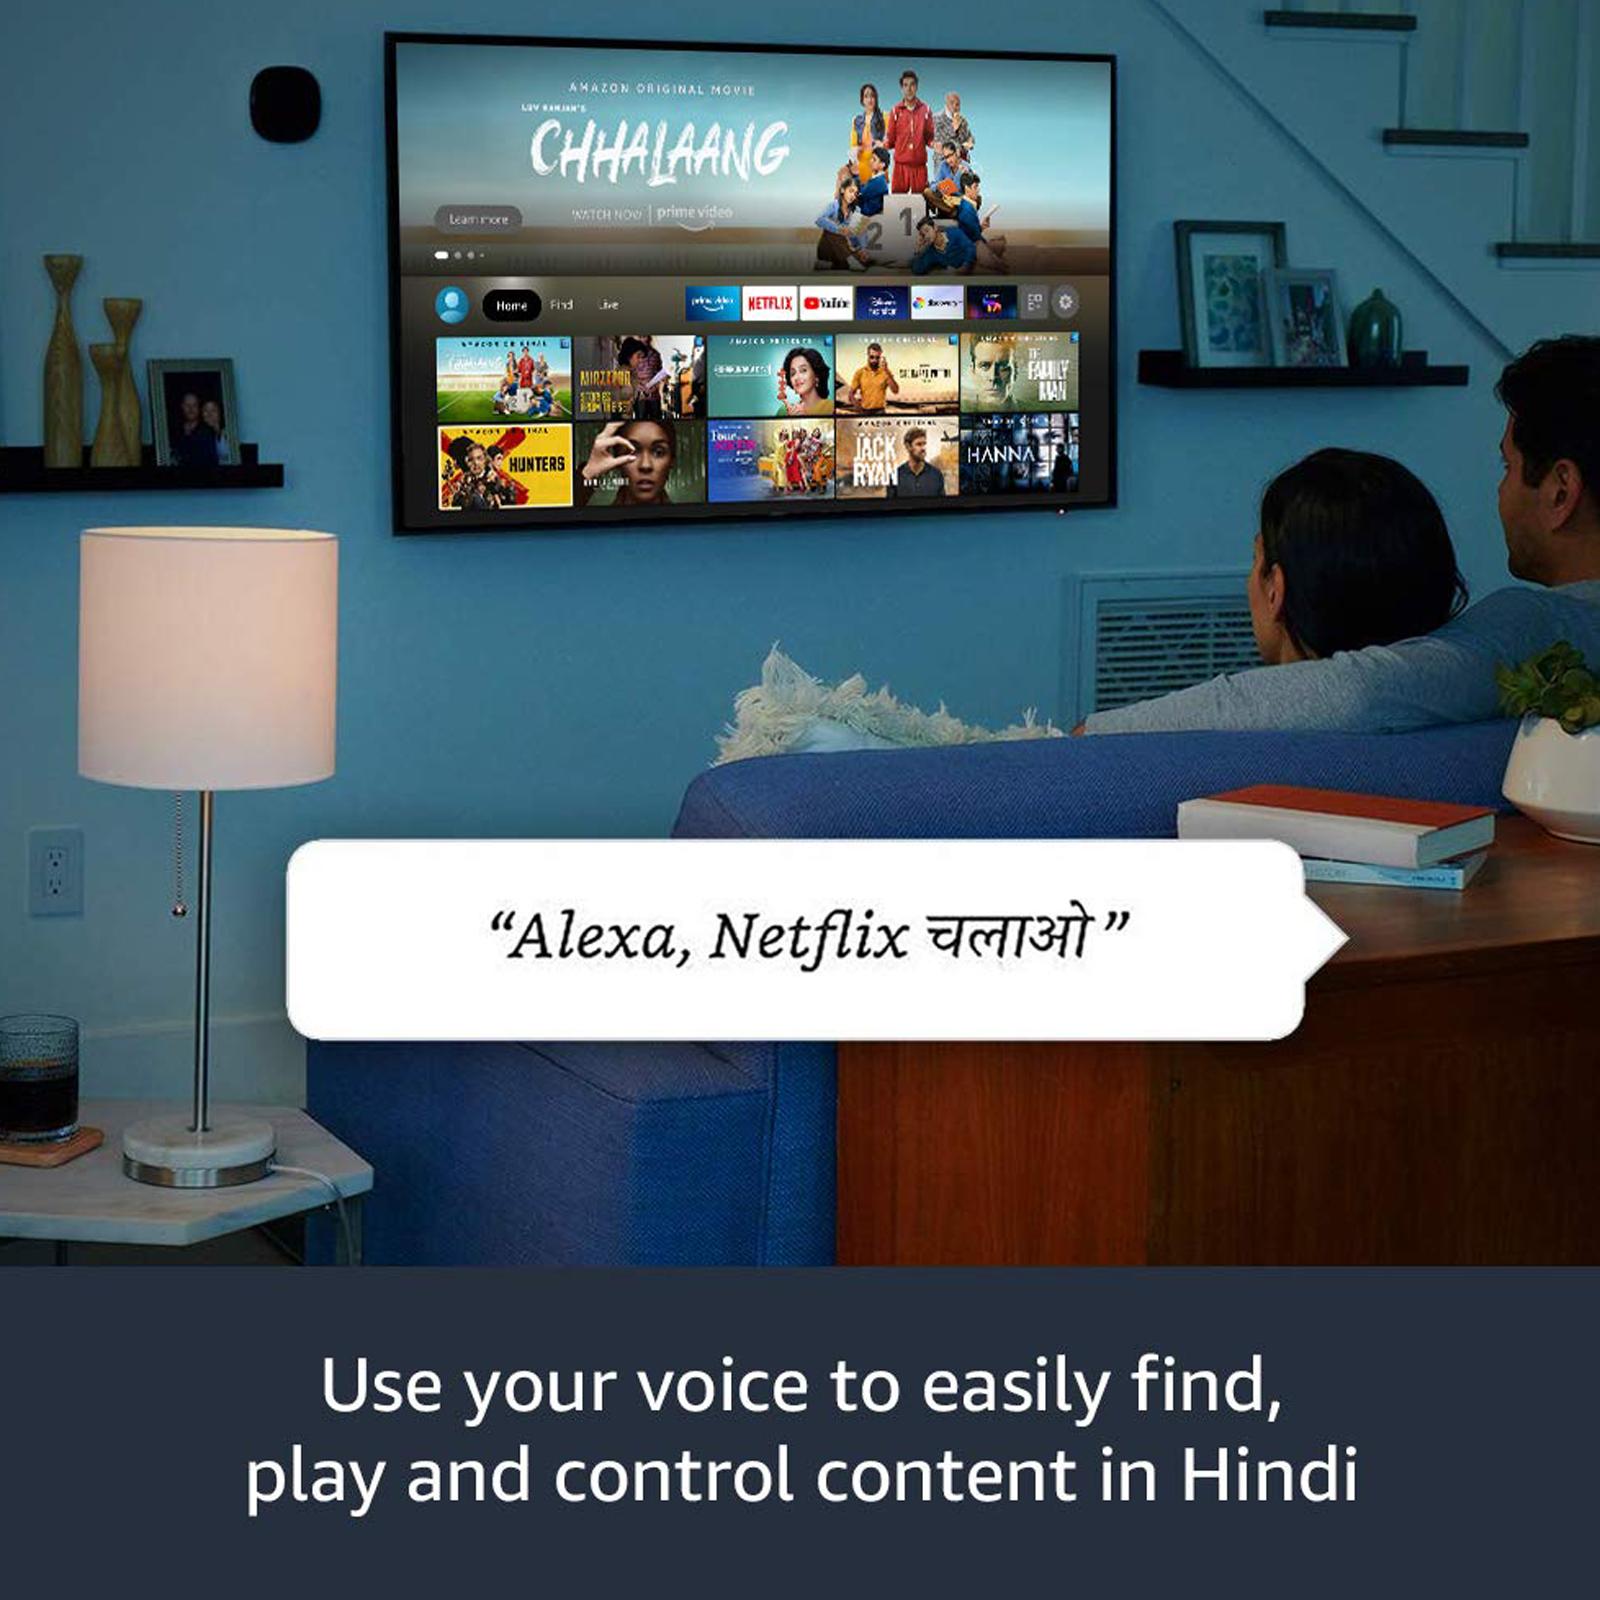 Amazon Fire TV Stick 3rd Gen with Alexa Voice Remote (Quad Core Processor, B08C1KQRR5, Black) 7